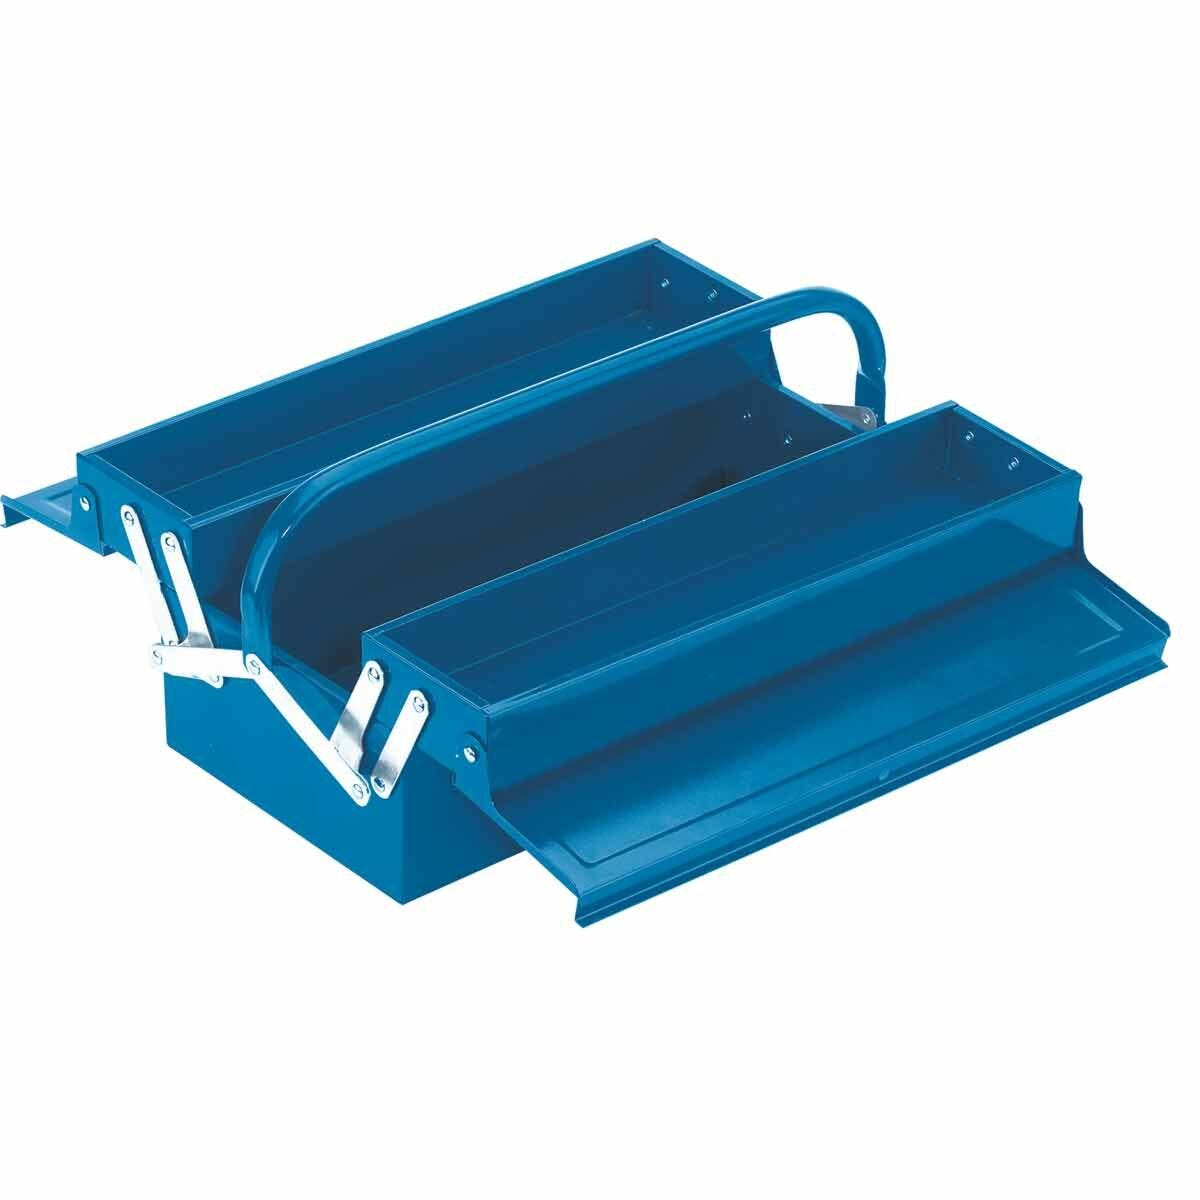 Draper 404mm 2 Tray Cantilever Tool Box